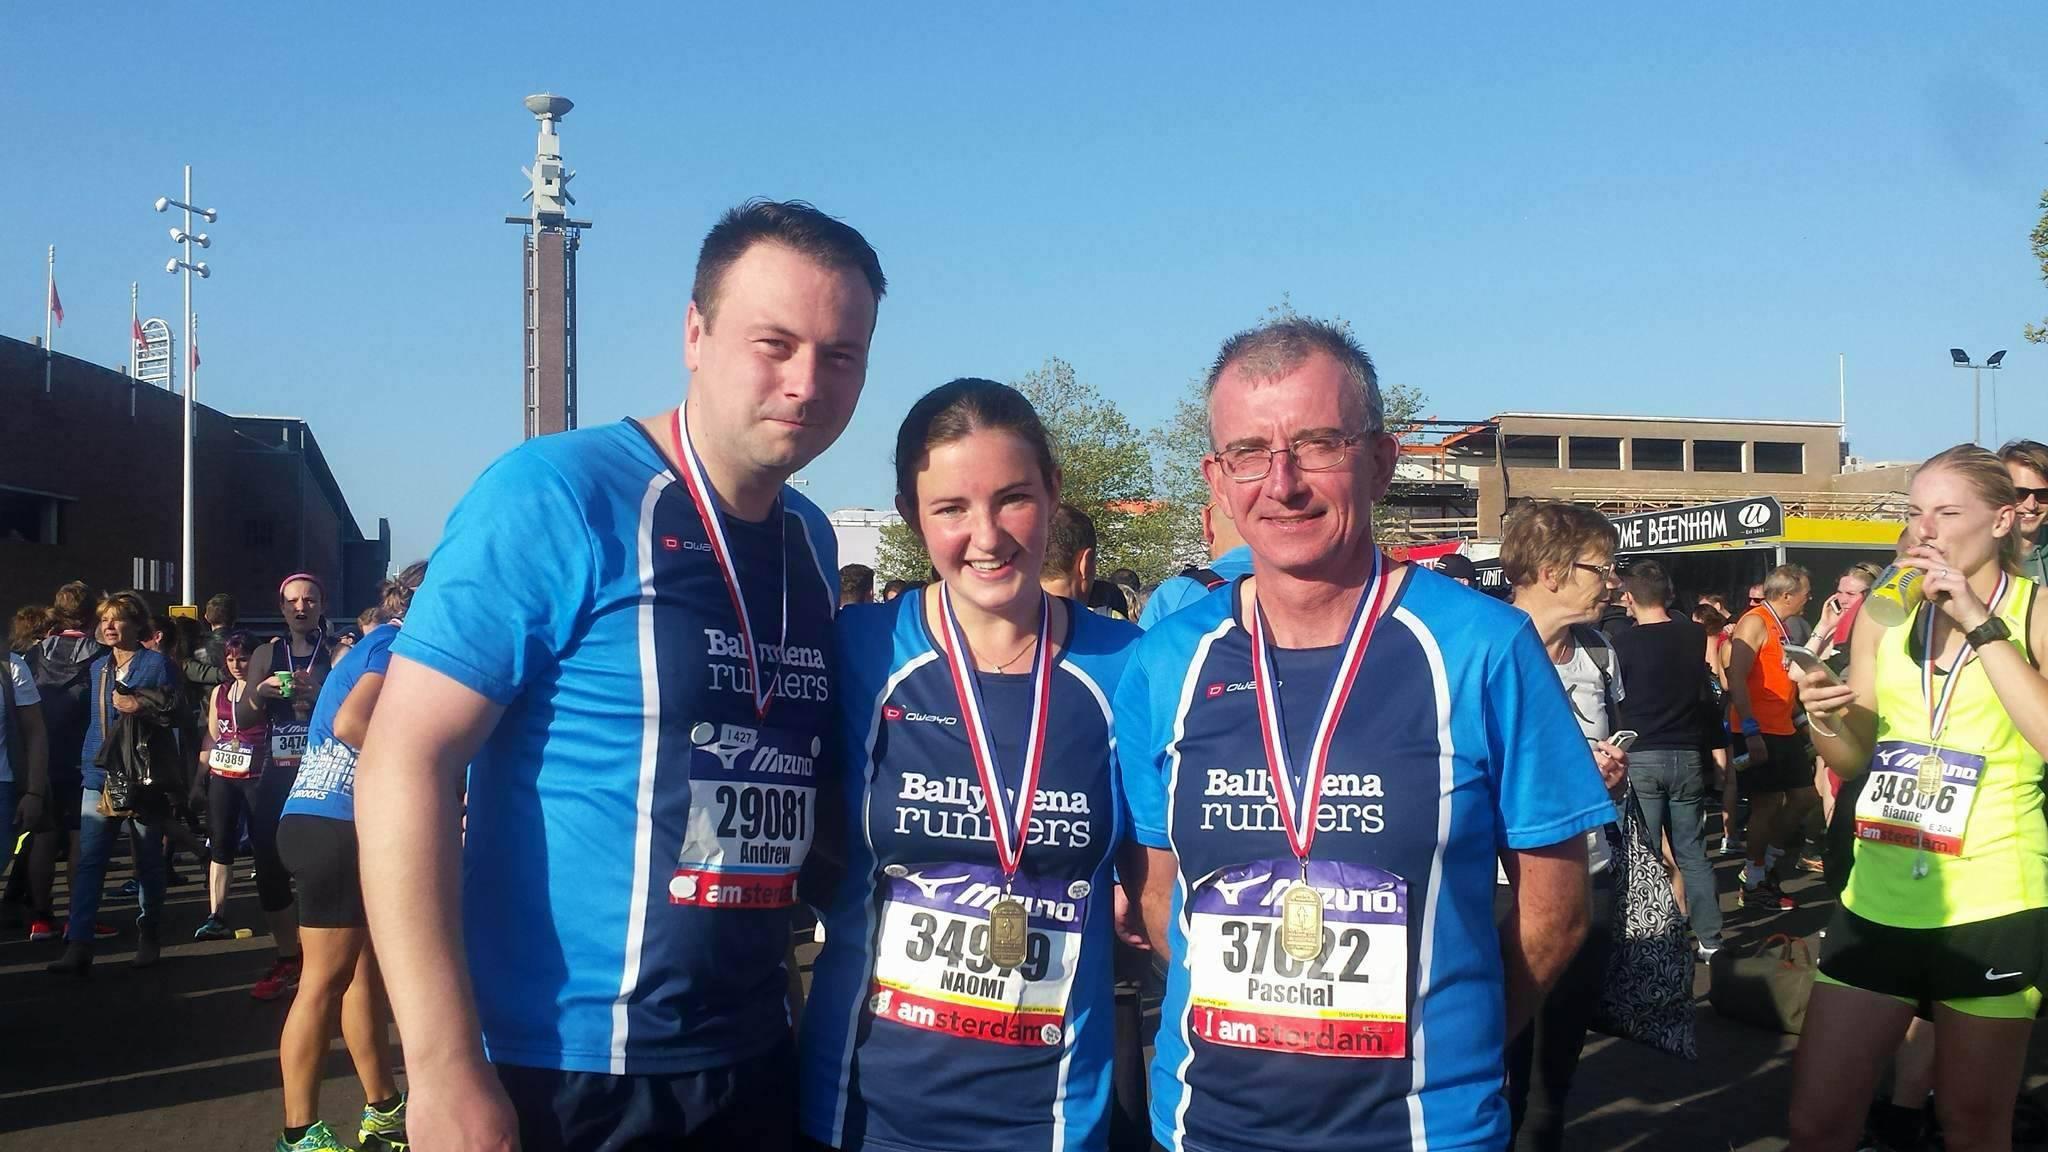 Andrew Hutchinson, Naomi Hutchinson and Paschal O'Sullivan proudly display their Amsterdam Half Marathon medals